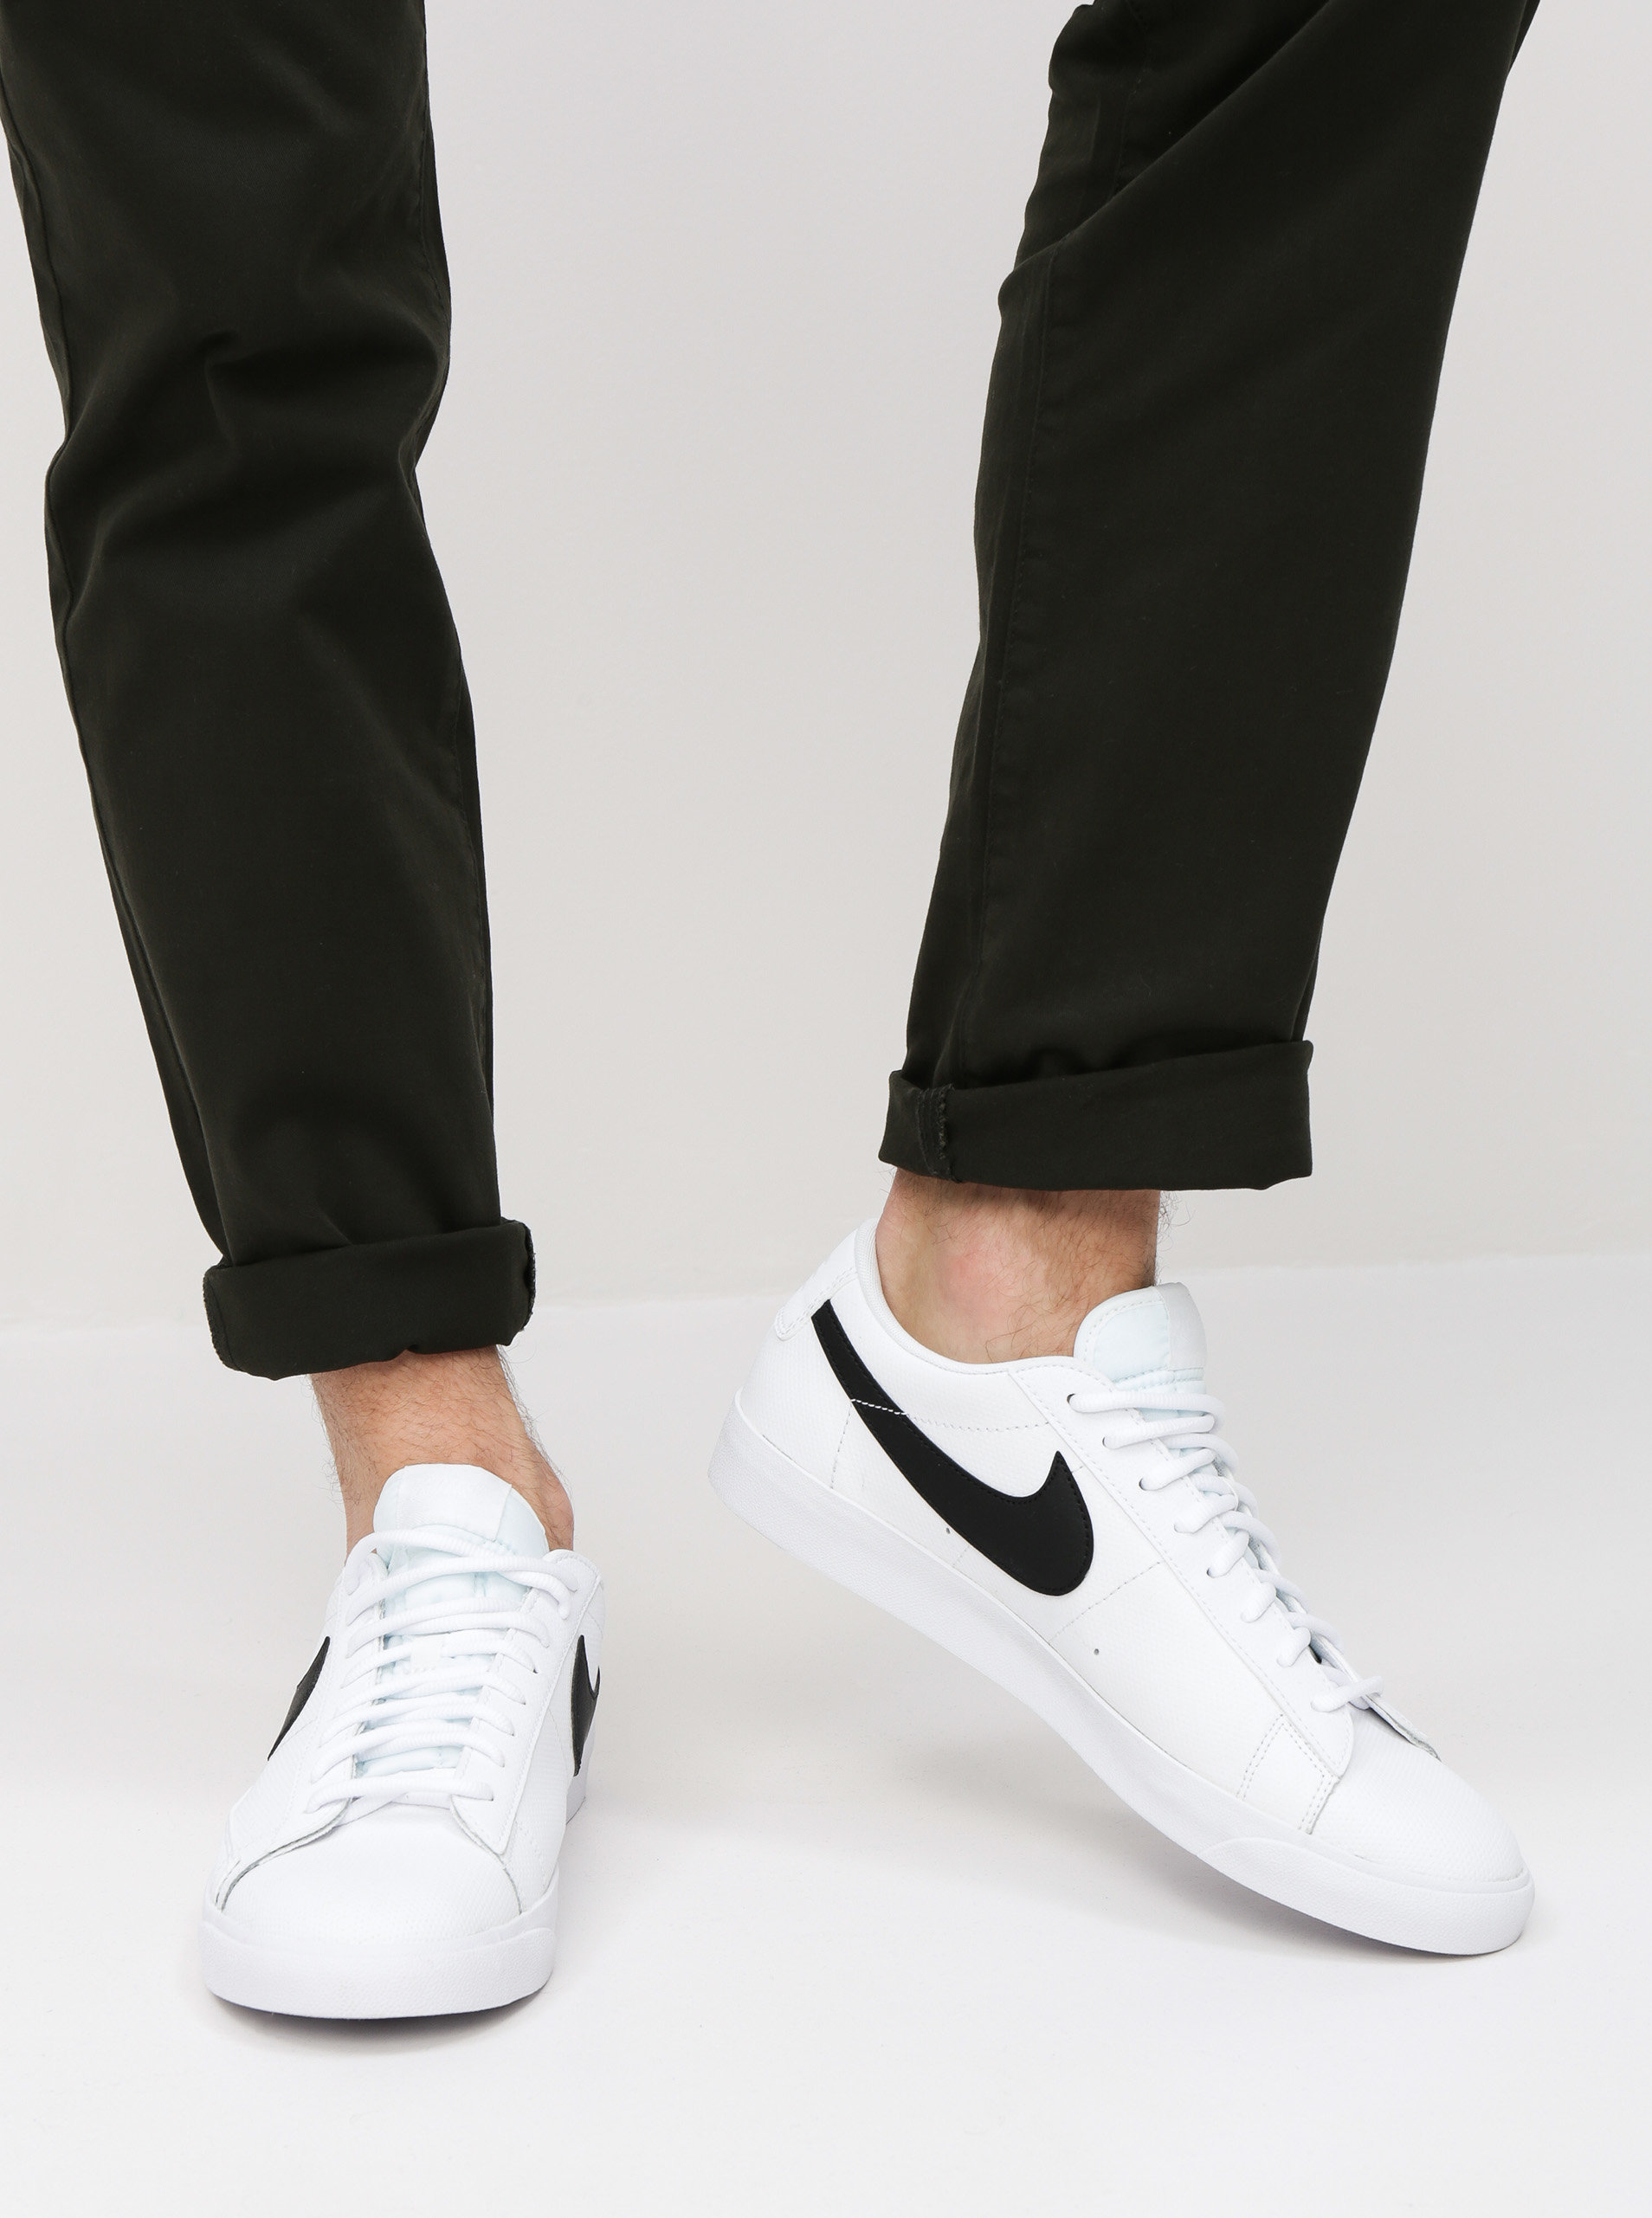 6931b990d152 Biele pánske kožené tenisky Nike Blazer Low ...